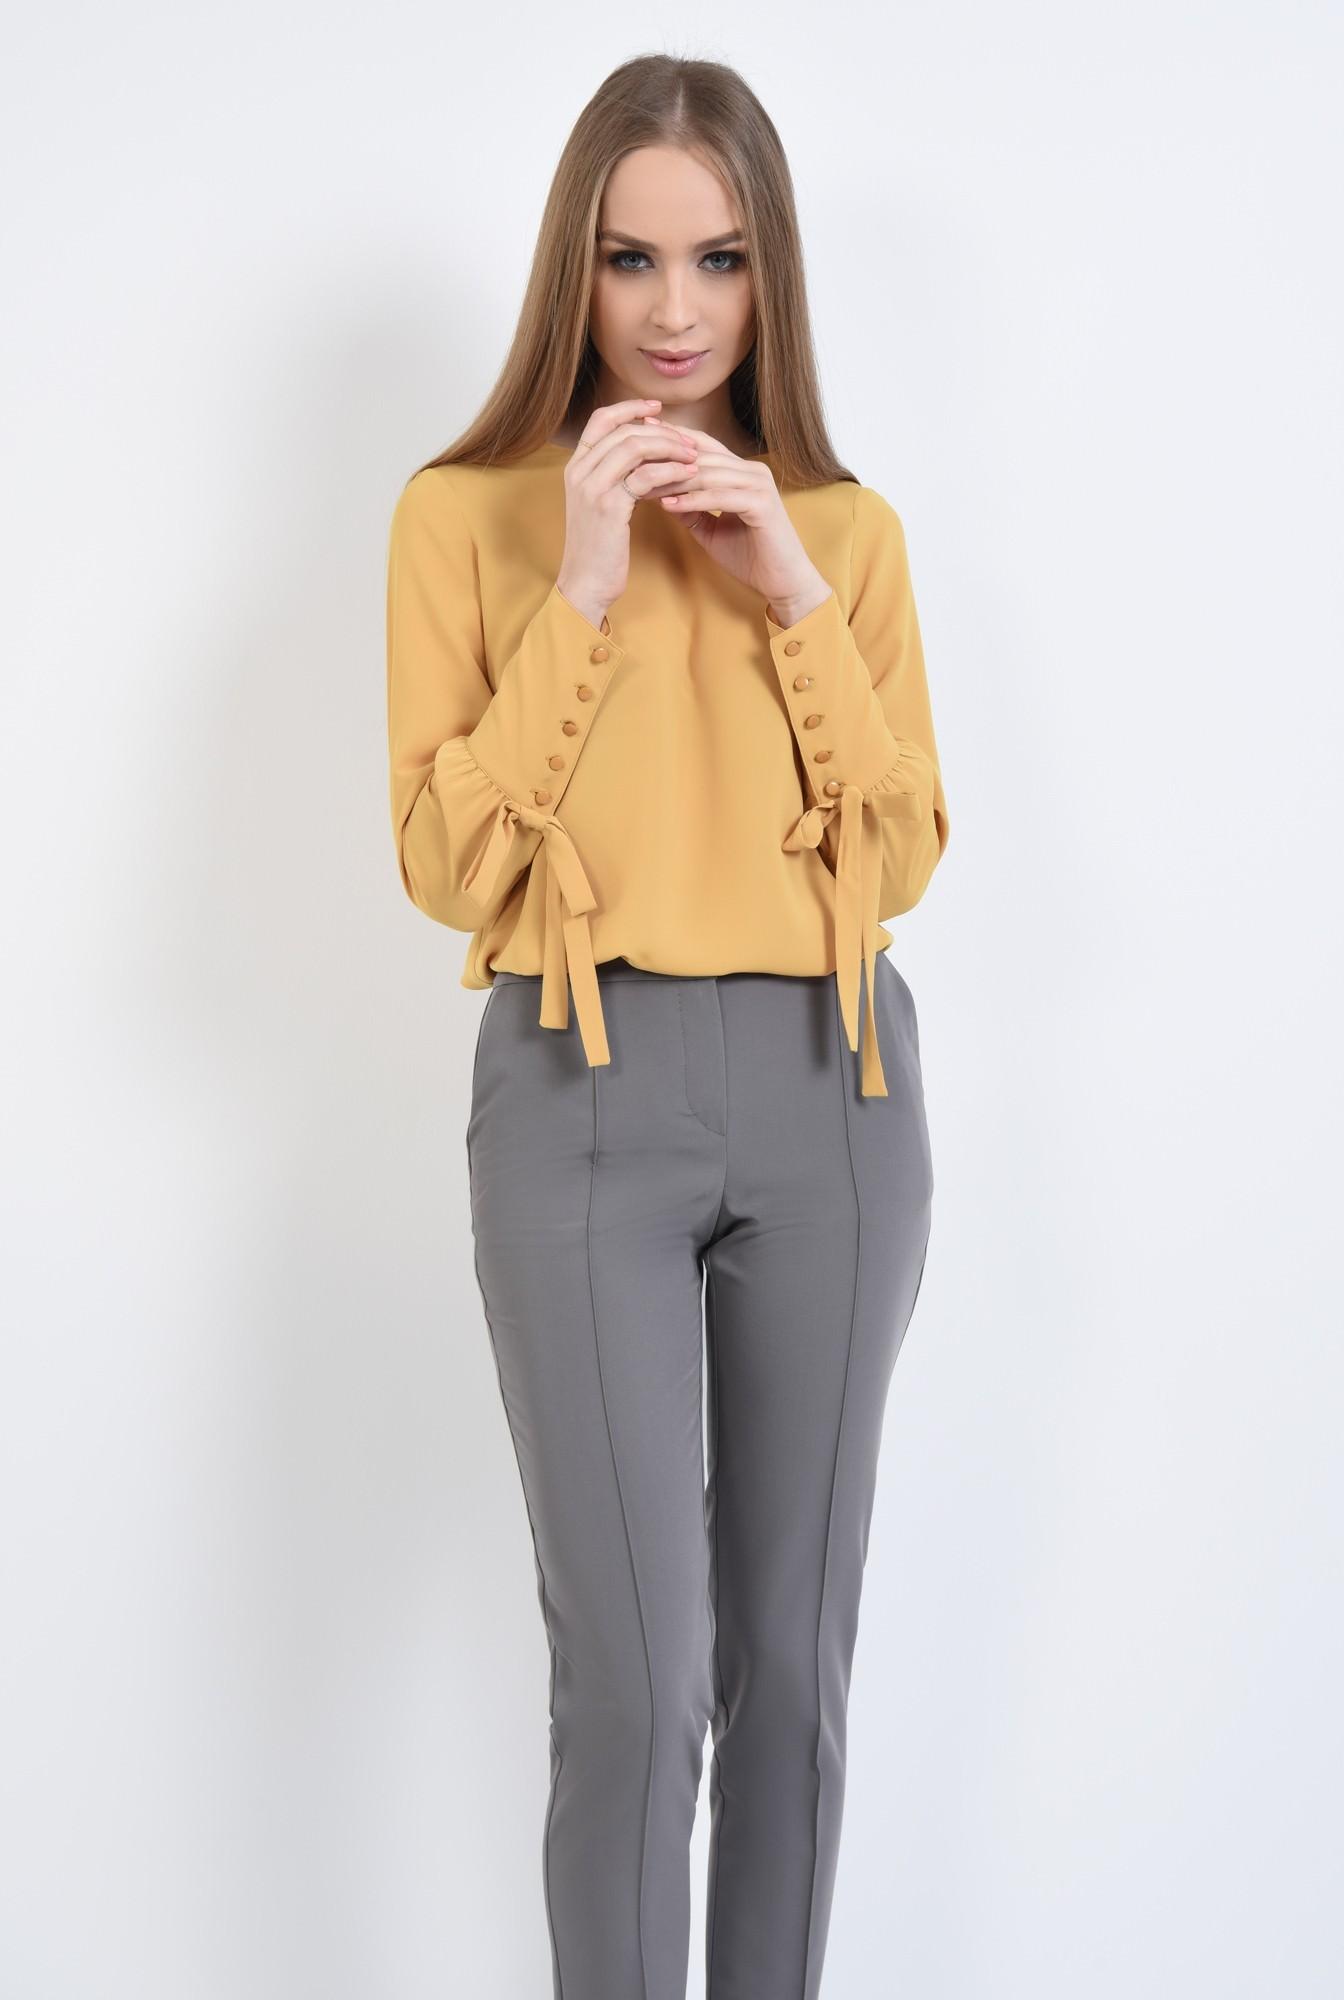 0 - Bluza eleganta, croi drept, maneci bufante